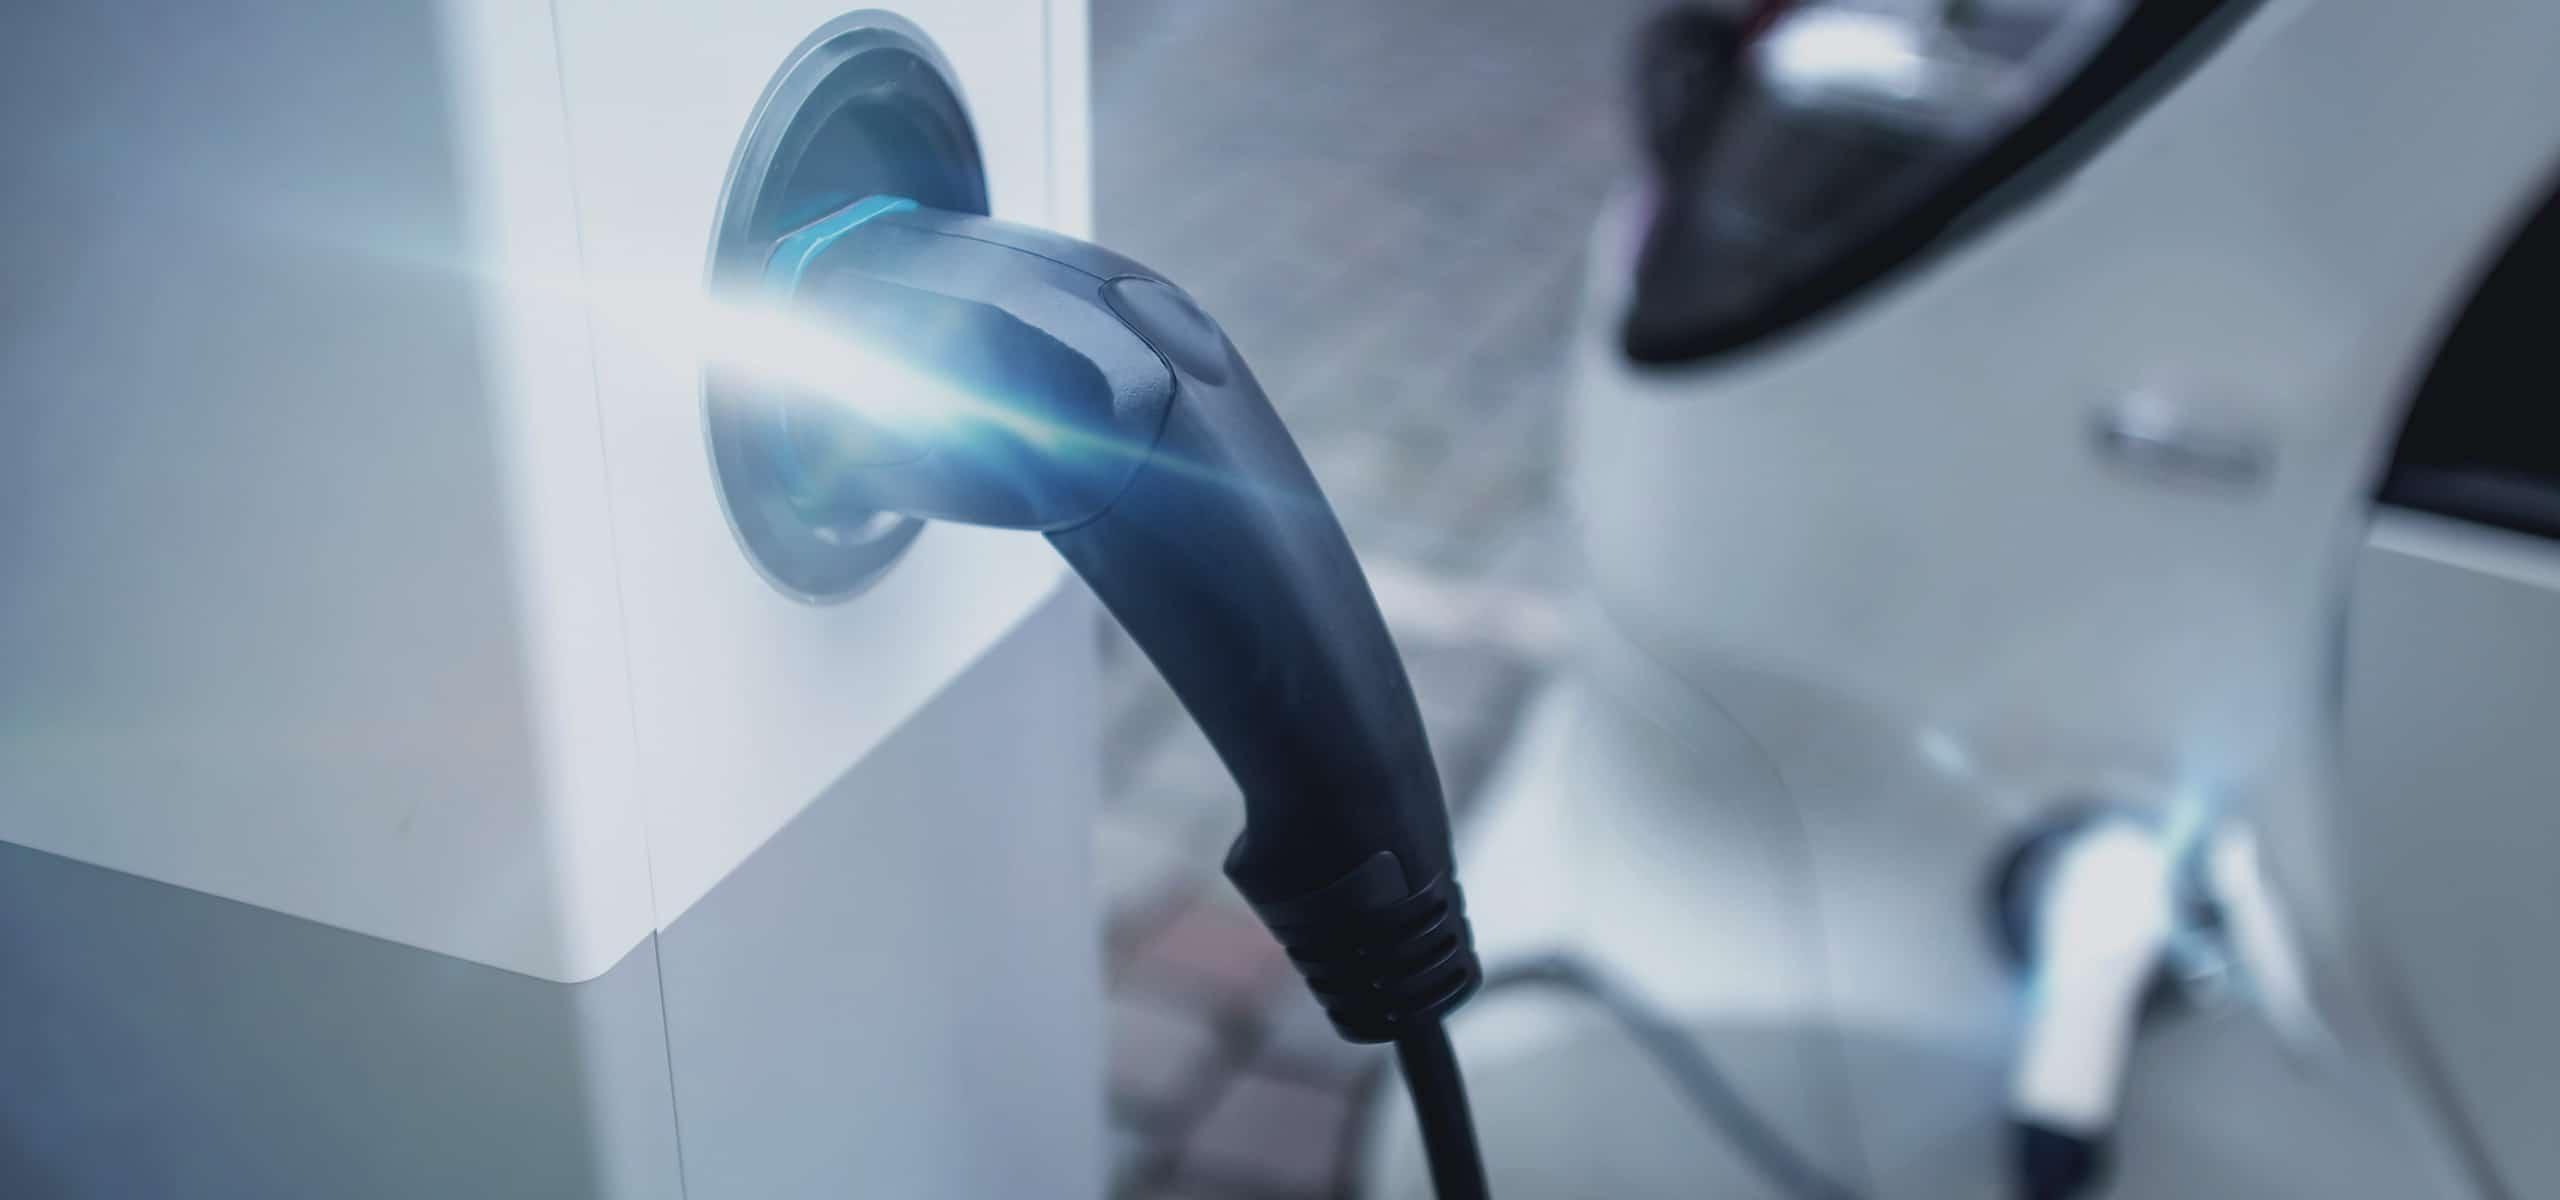 Één op de tien auto's elektrisch in 2020